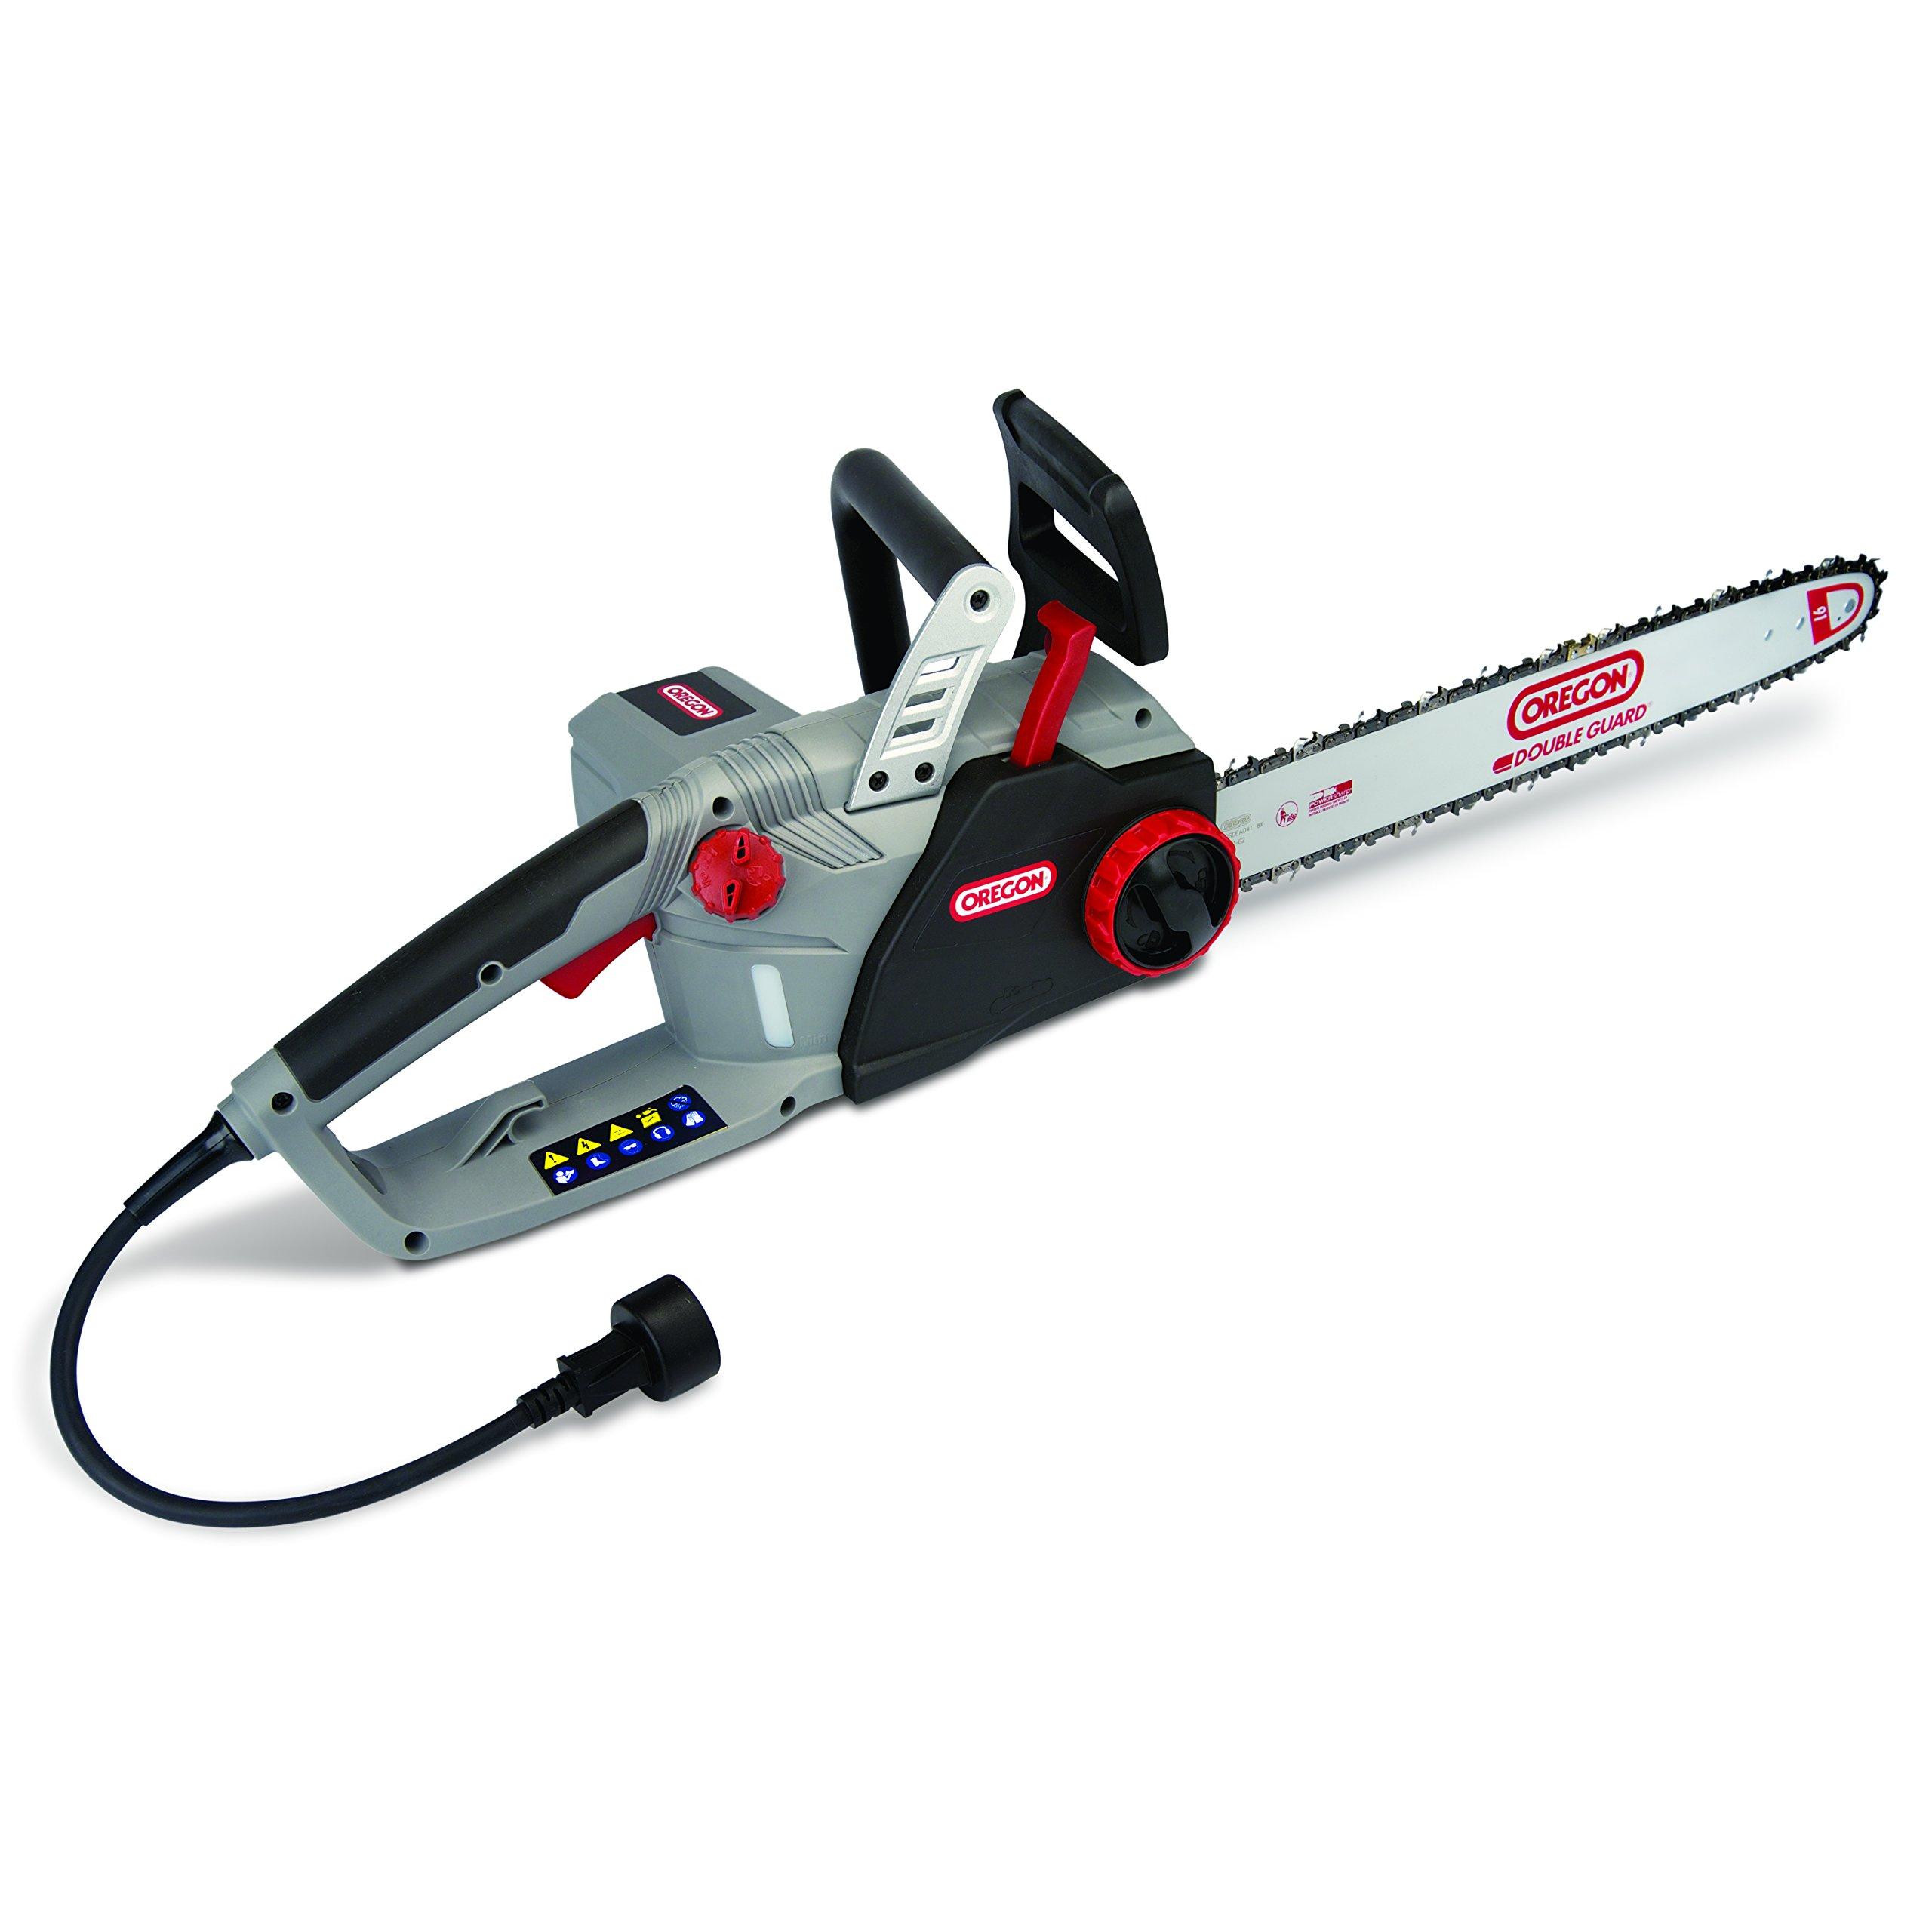 Oregon CS1500 Self-Sharpening Electric Chain Saw